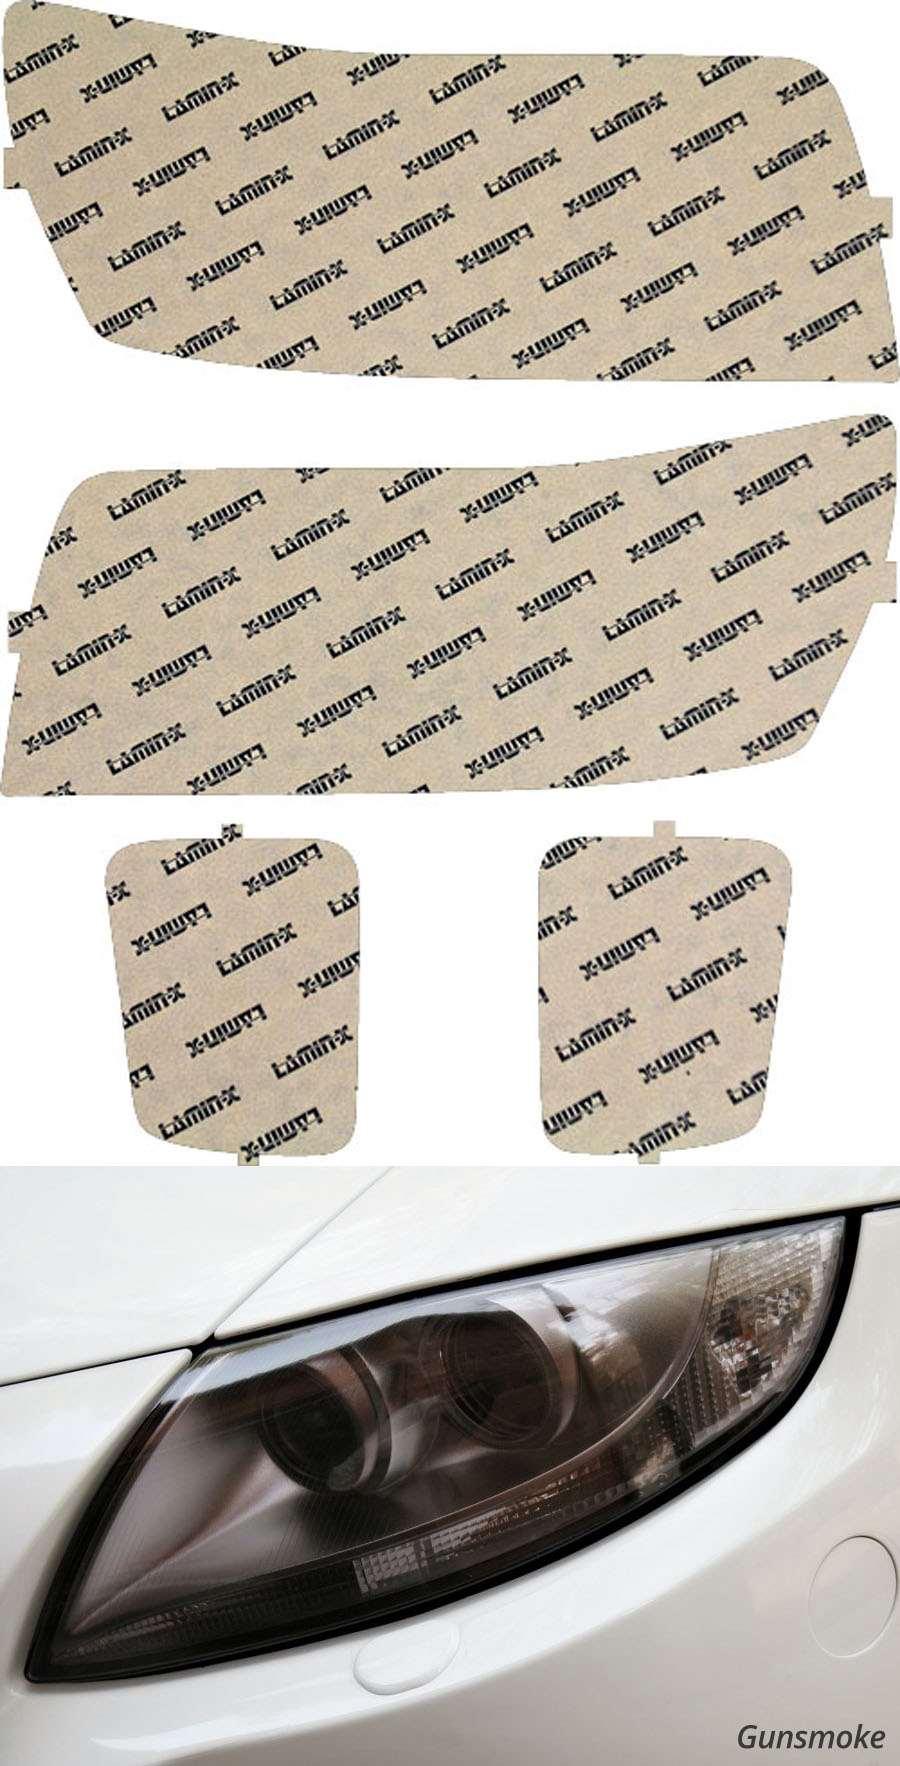 Infiniti QX56 04-10 Gunsmoke Headlight Covers Lamin-X I003G